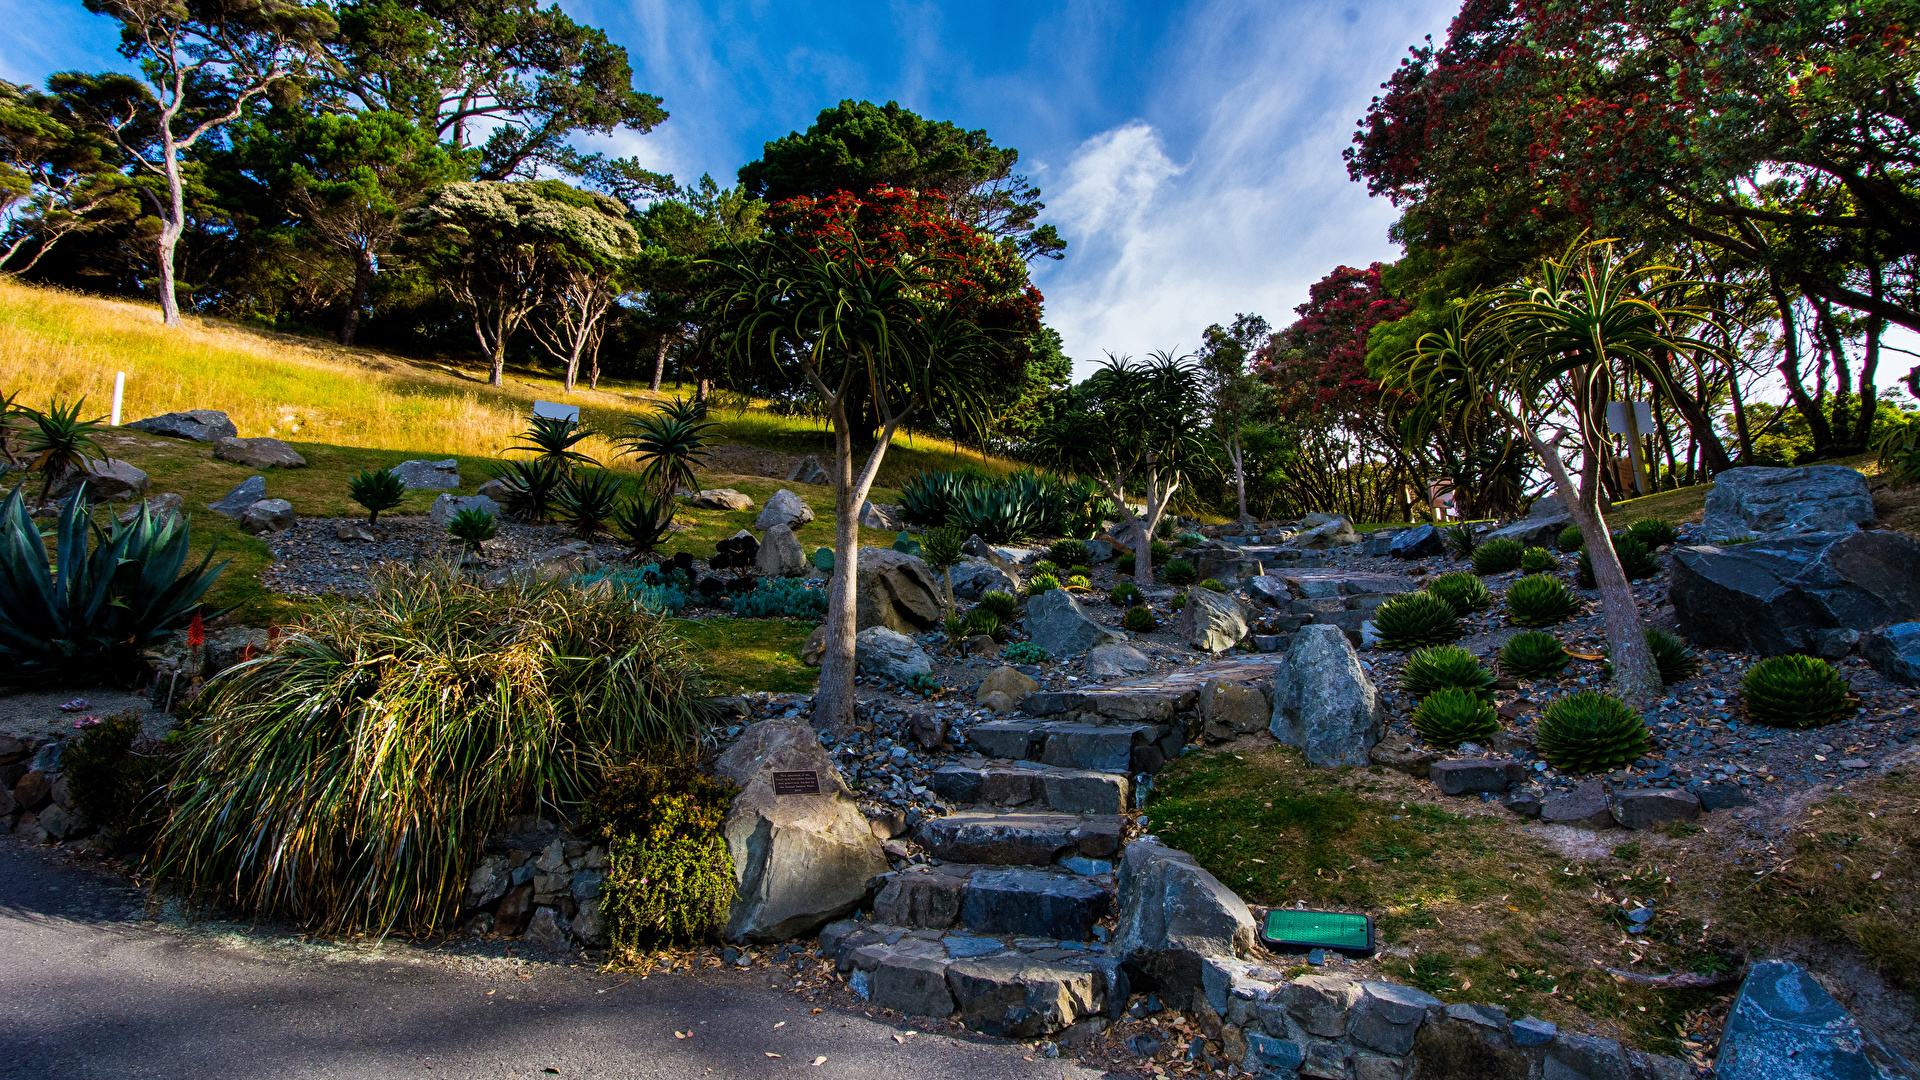 Images New Zealand Wellington Botanical garden Nature 1920x1080 1920x1080